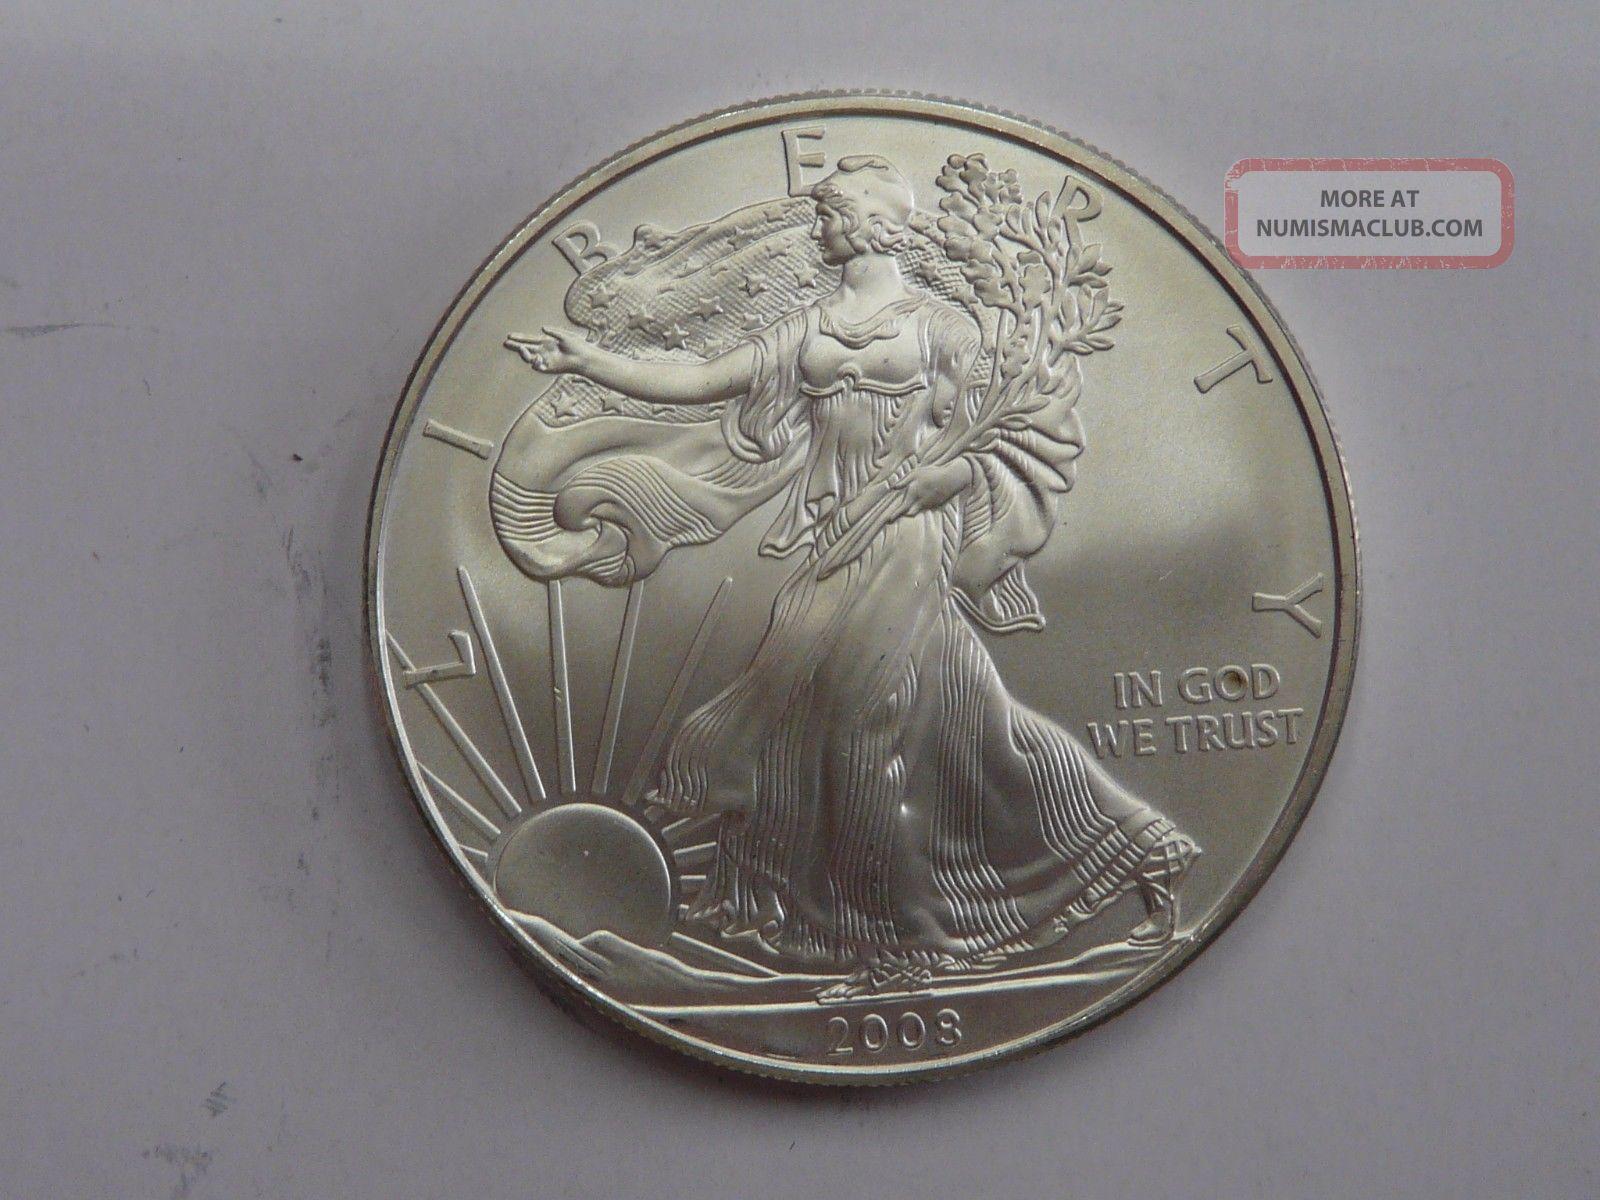 2008 American Eagle Walking Liberty 1 Oz Fine Silver Dollar Bullion Bar 1oz Coin Unc